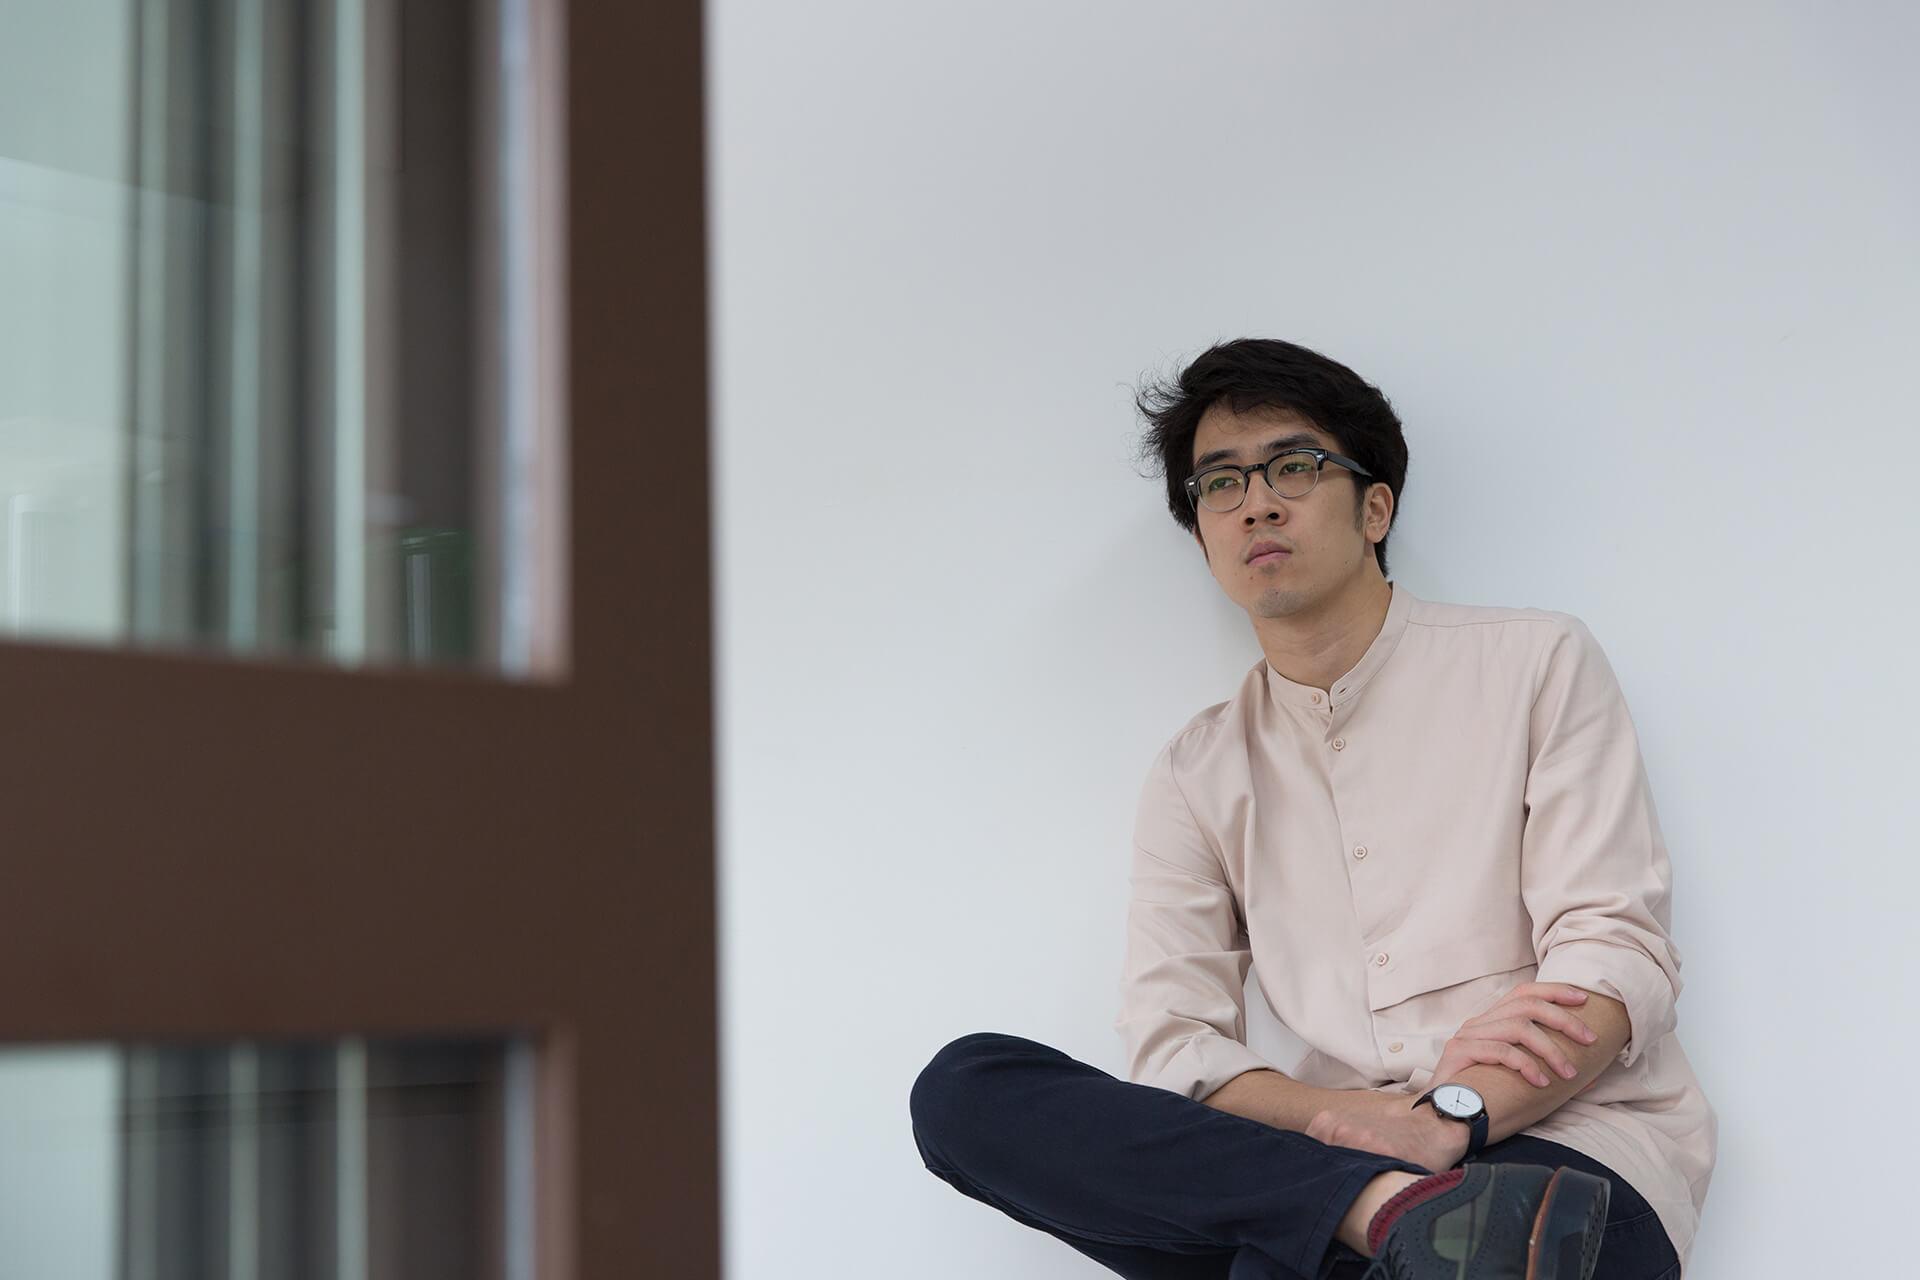 Charlie Lim 是新加坡唱作人,2012年曾來港參與Clockenflap的演出。